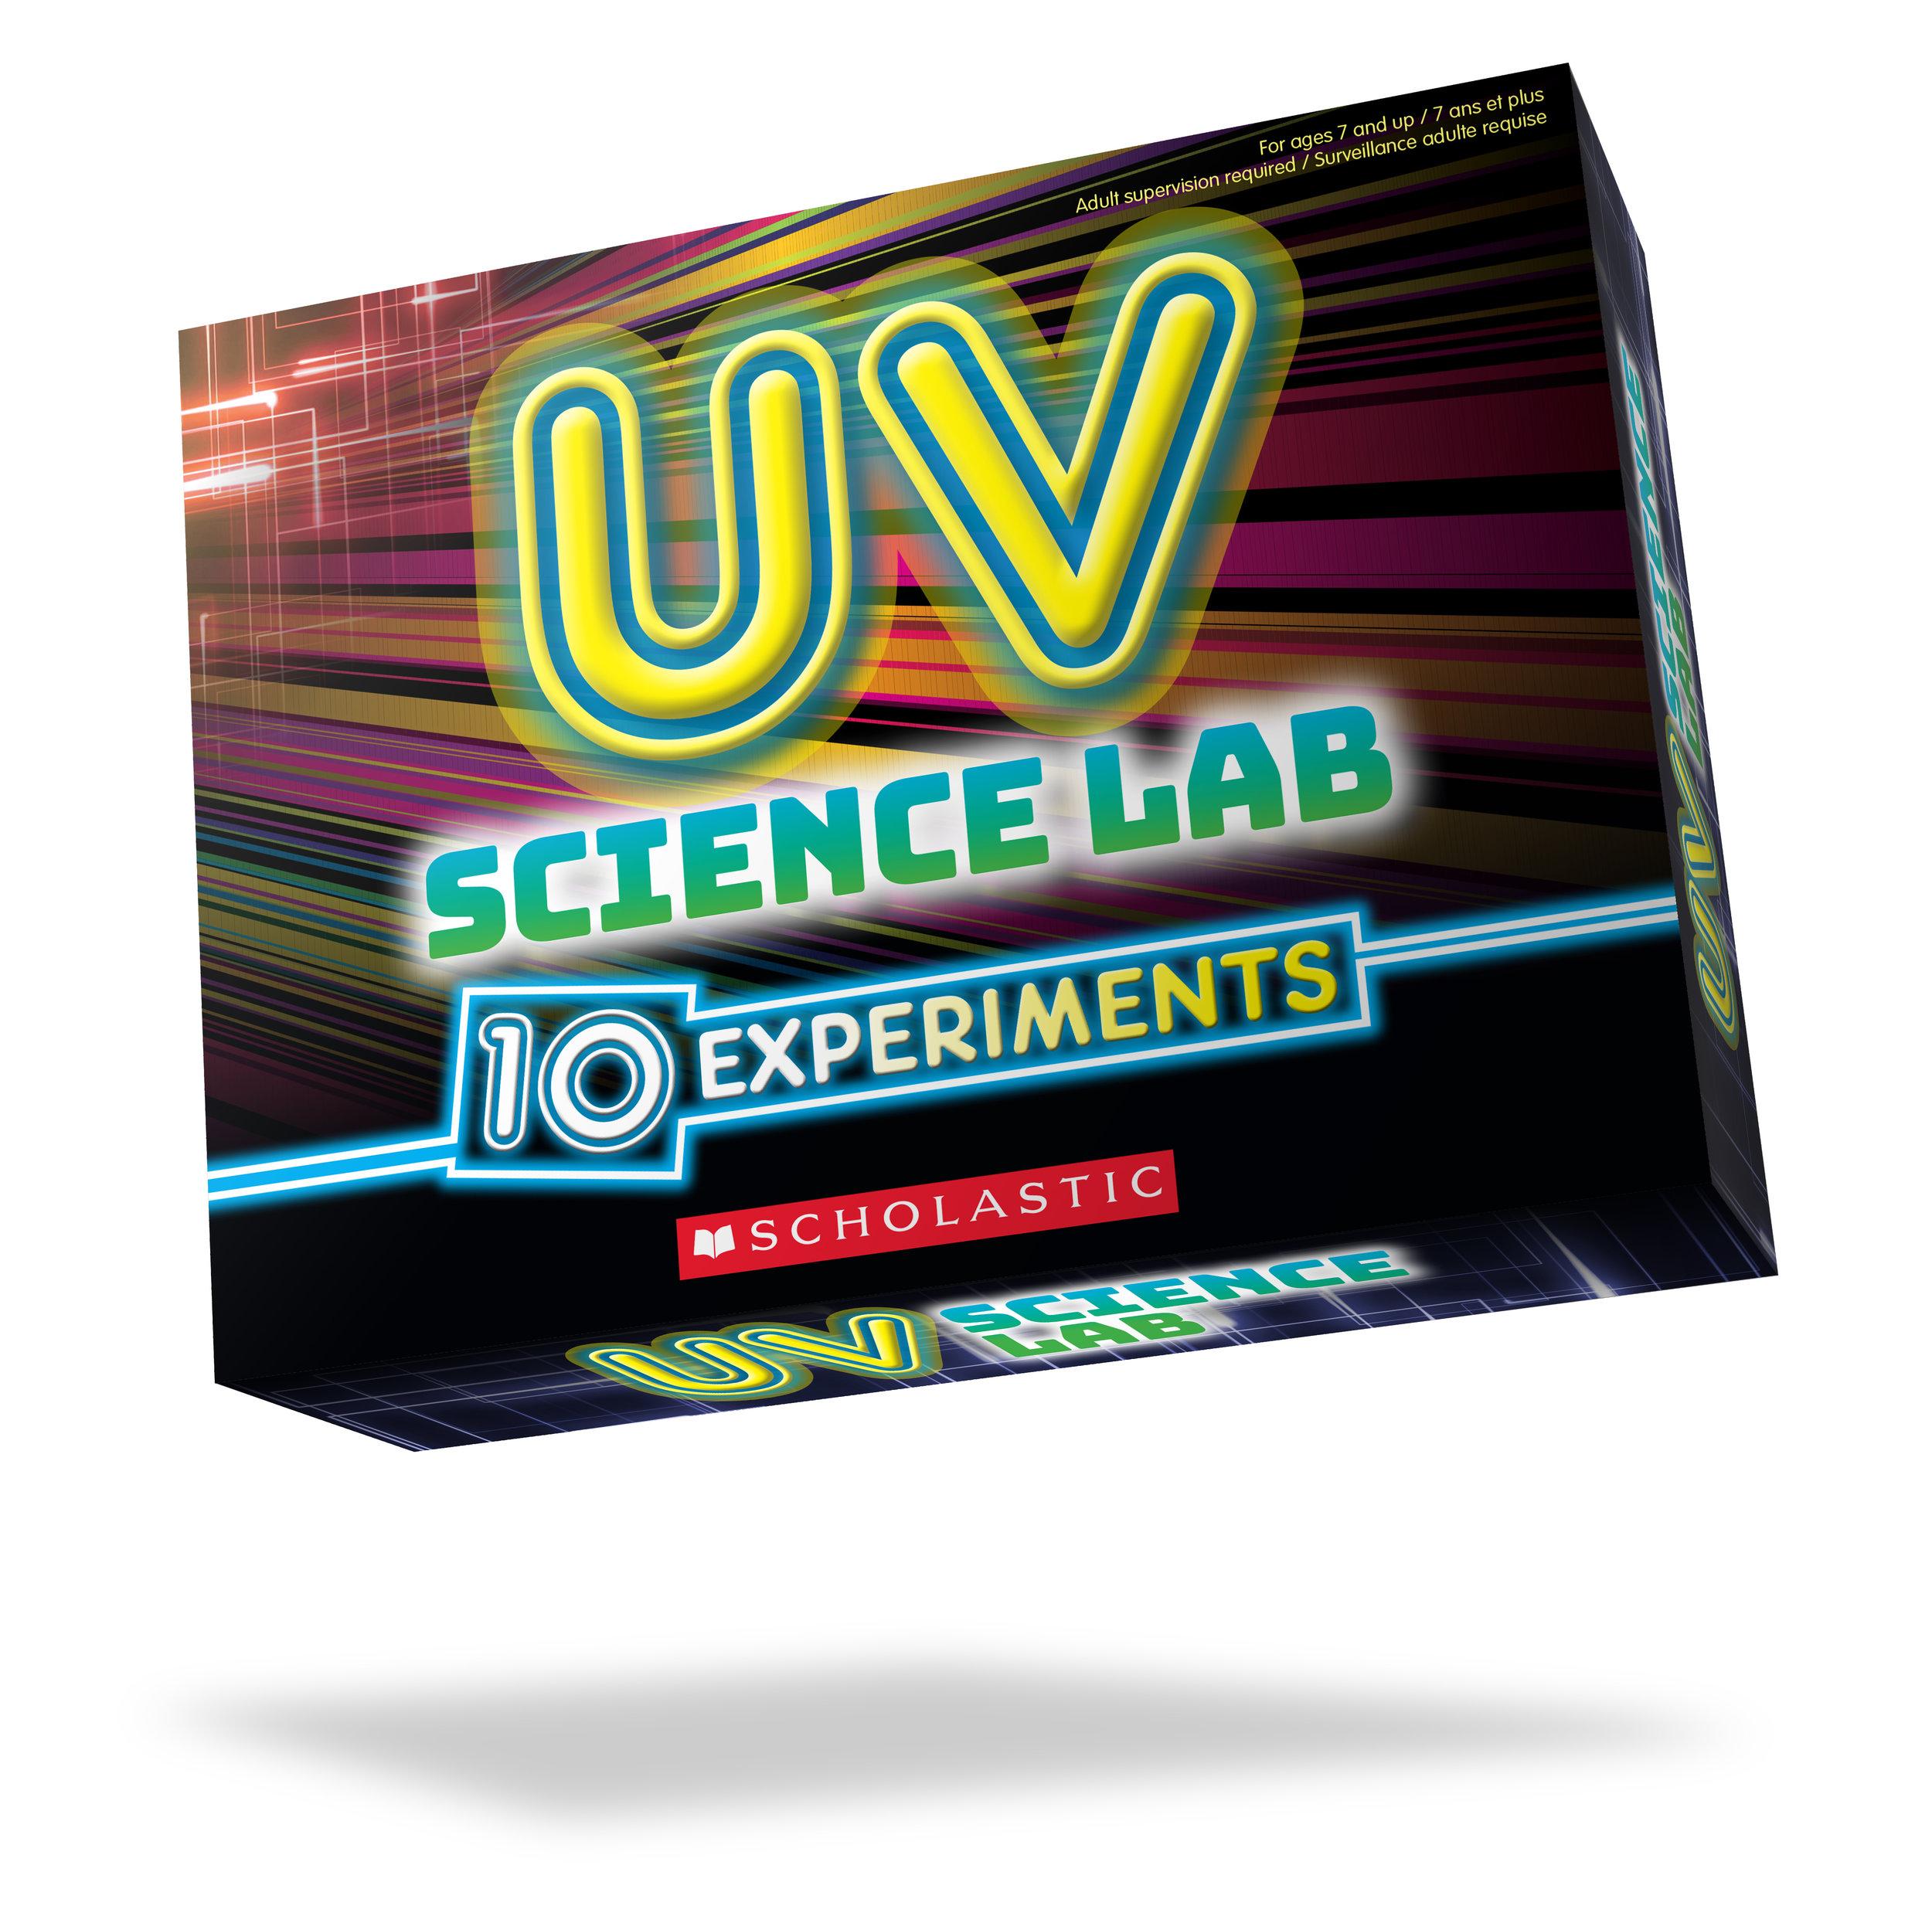 UV front box 3-perspective.jpg